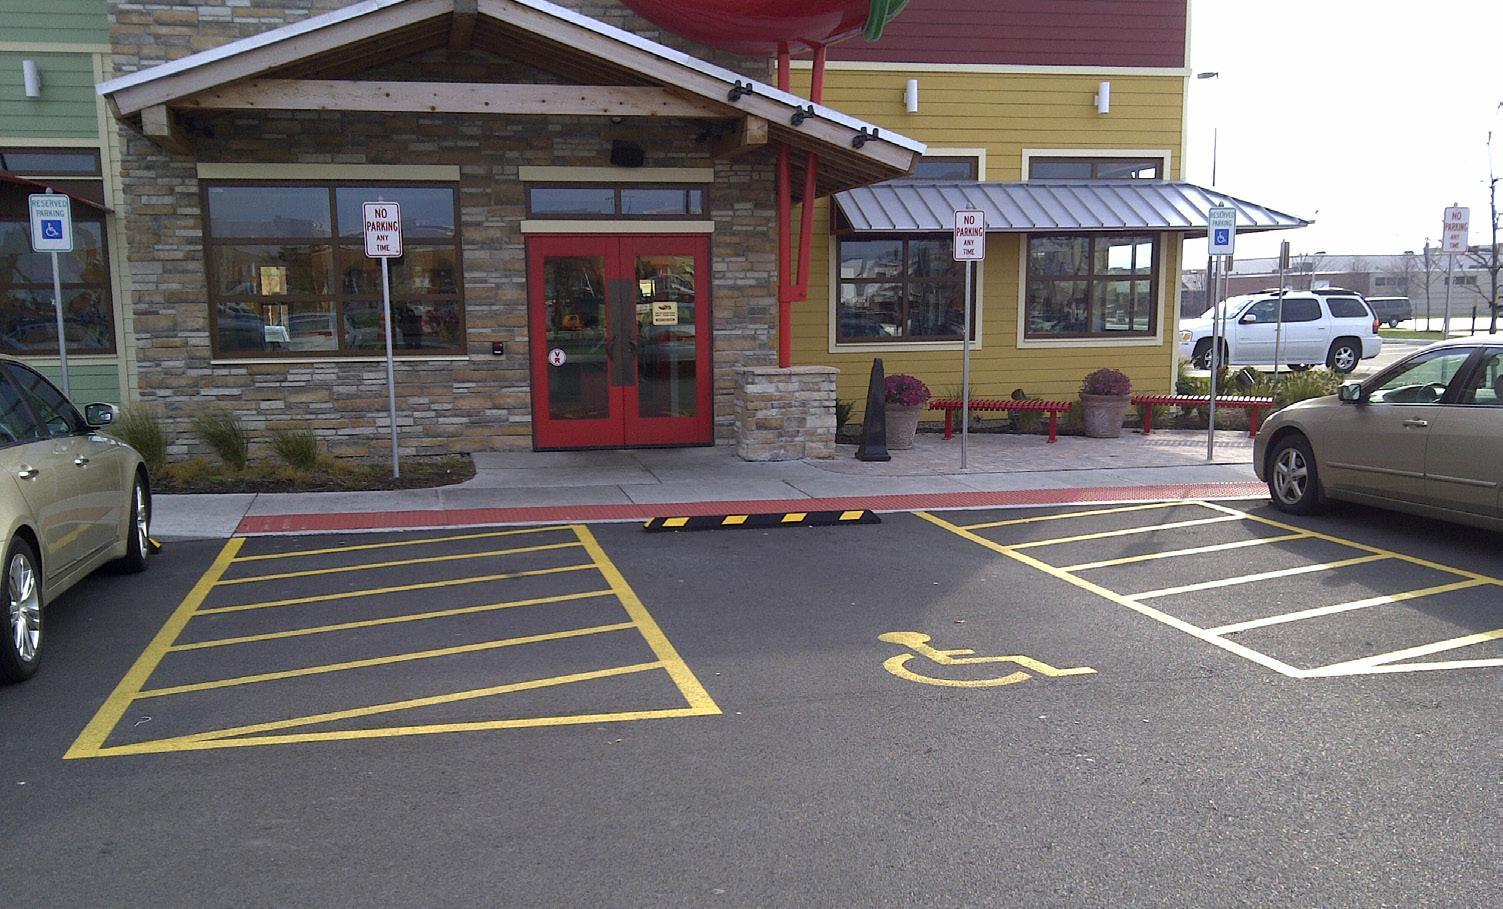 Dawnwillow craigslist parking lot hj